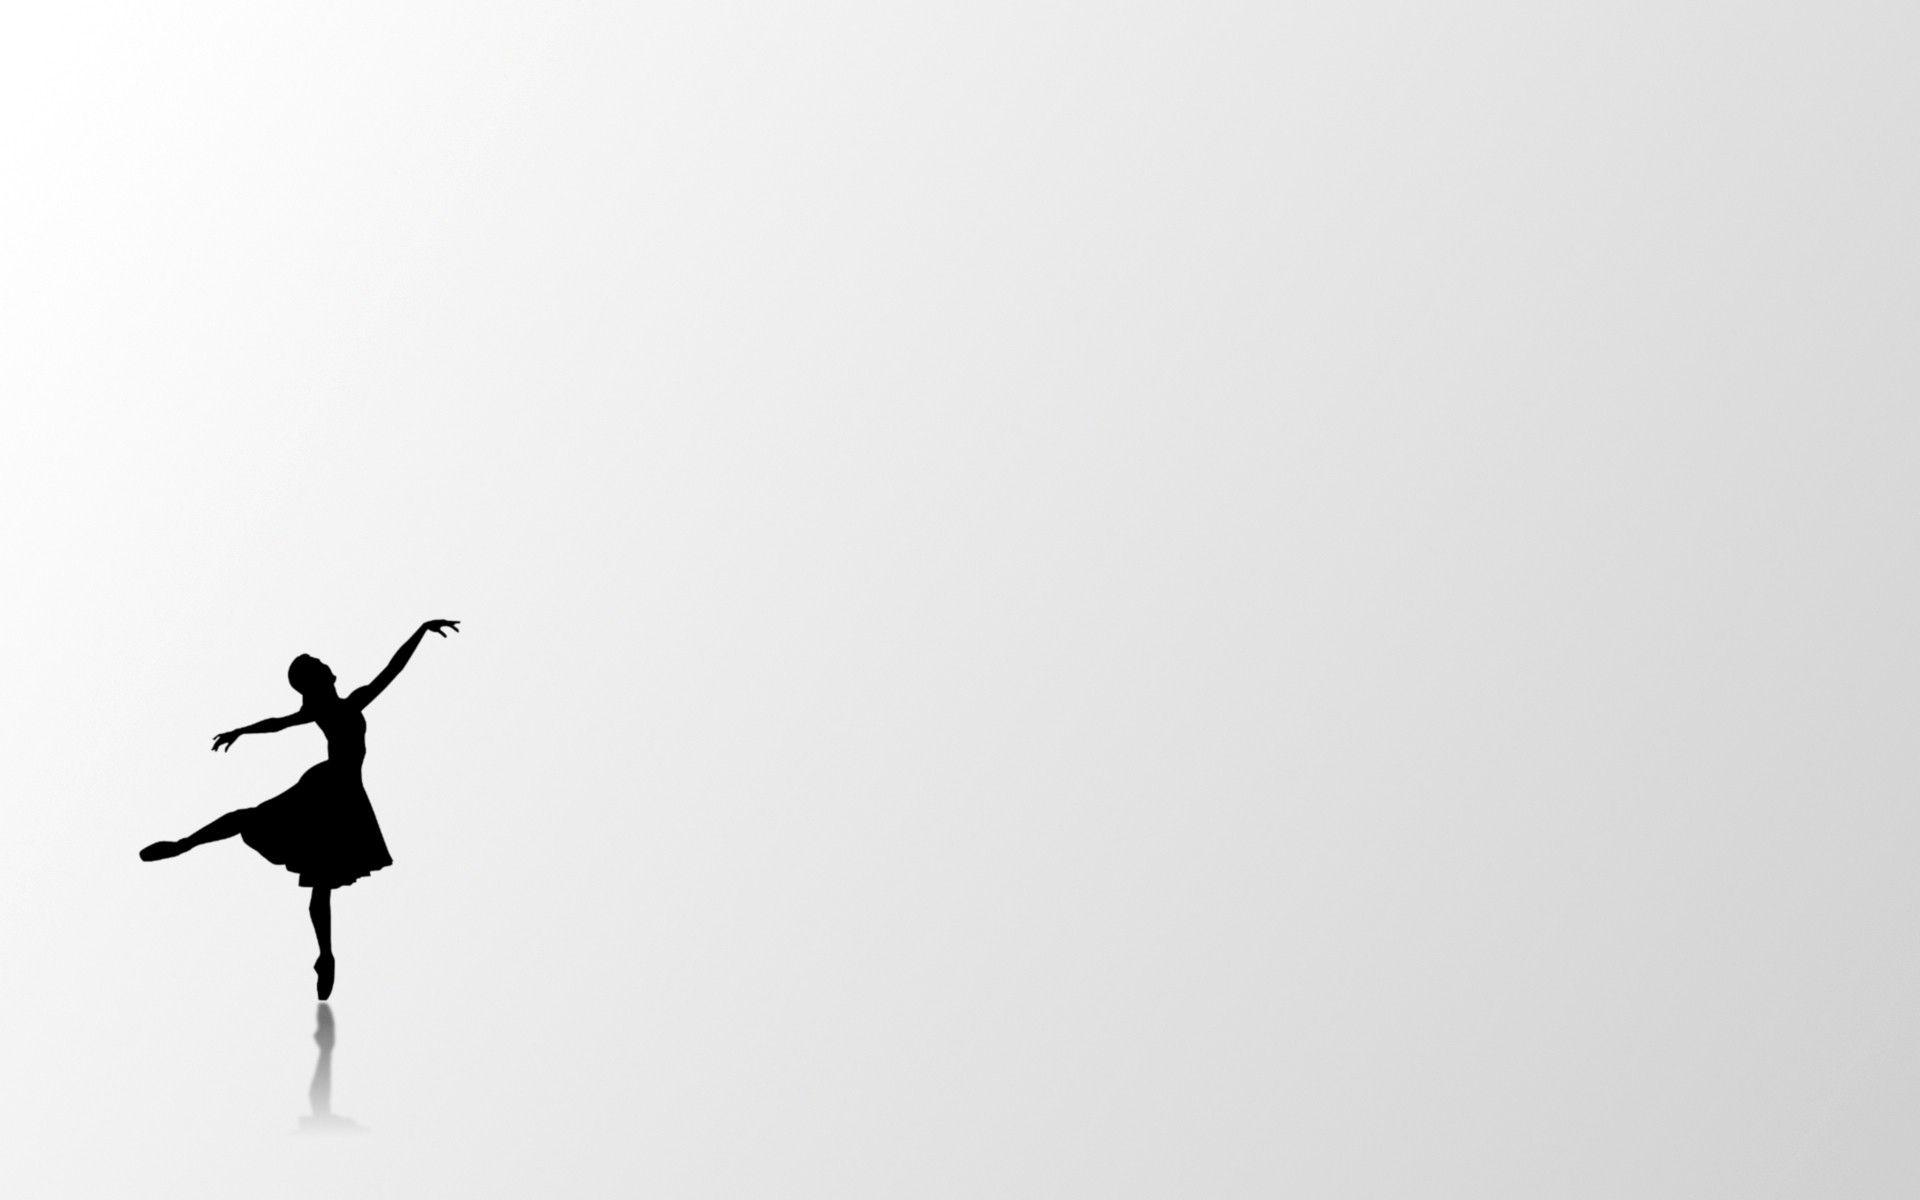 Dance Laptop Wallpapers   Top Dance Laptop Backgrounds 1920x1200